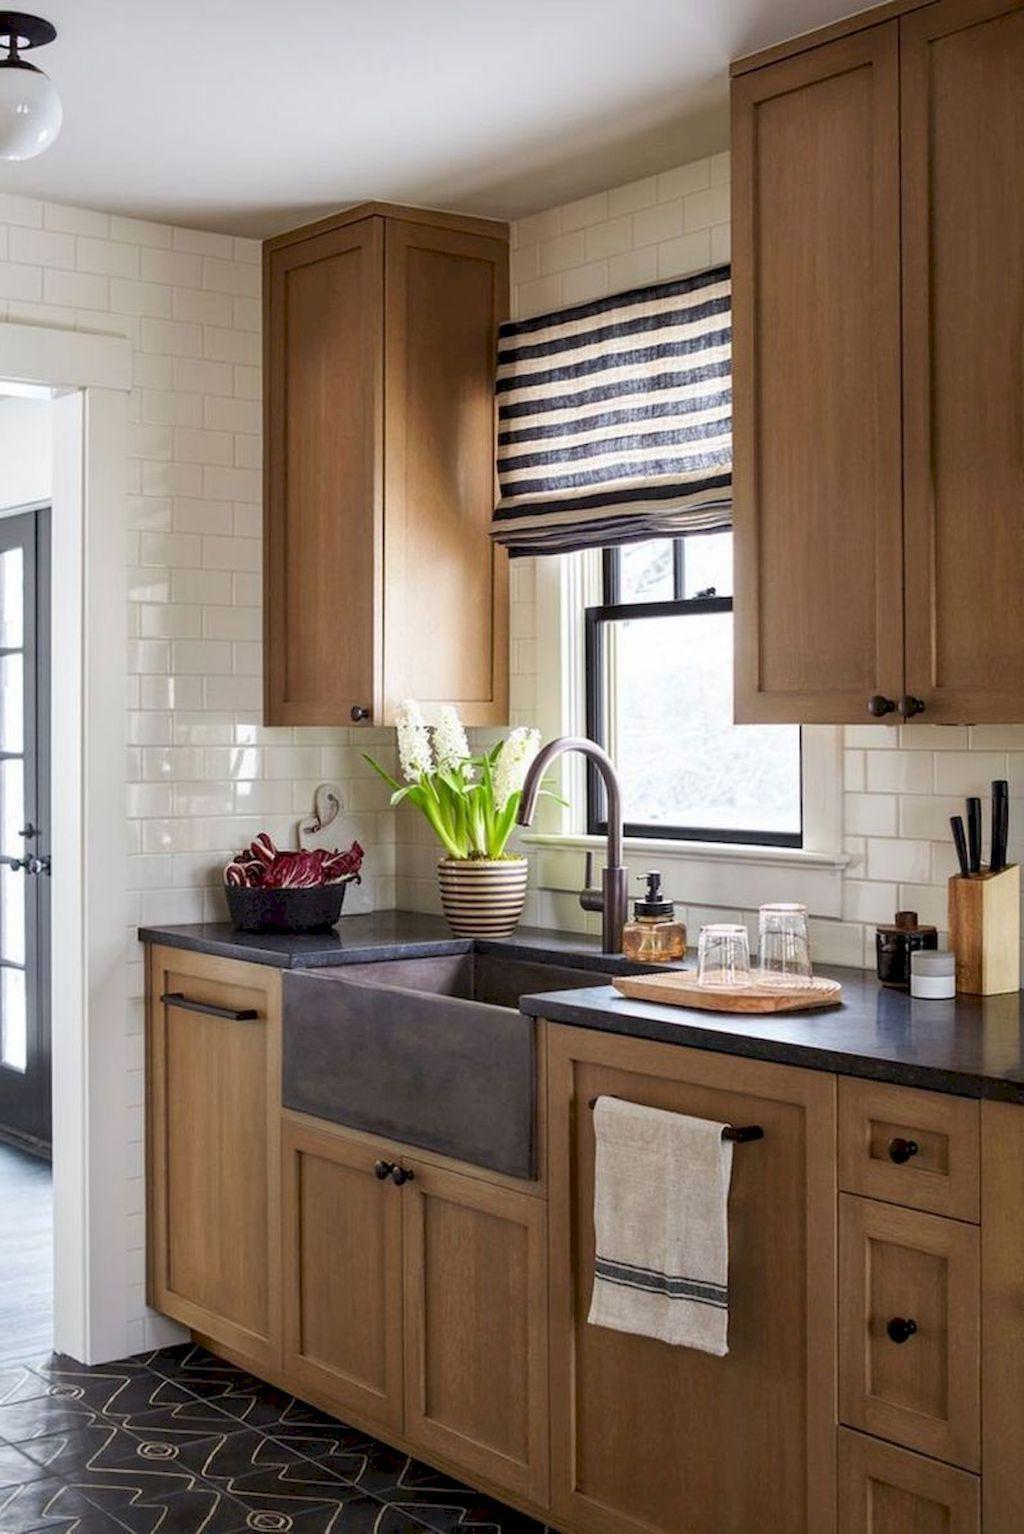 57 Modern Farmhouse Kitchen Cabinet Makeover Design Ideas Kitchen Cabinet Styles Kitchen